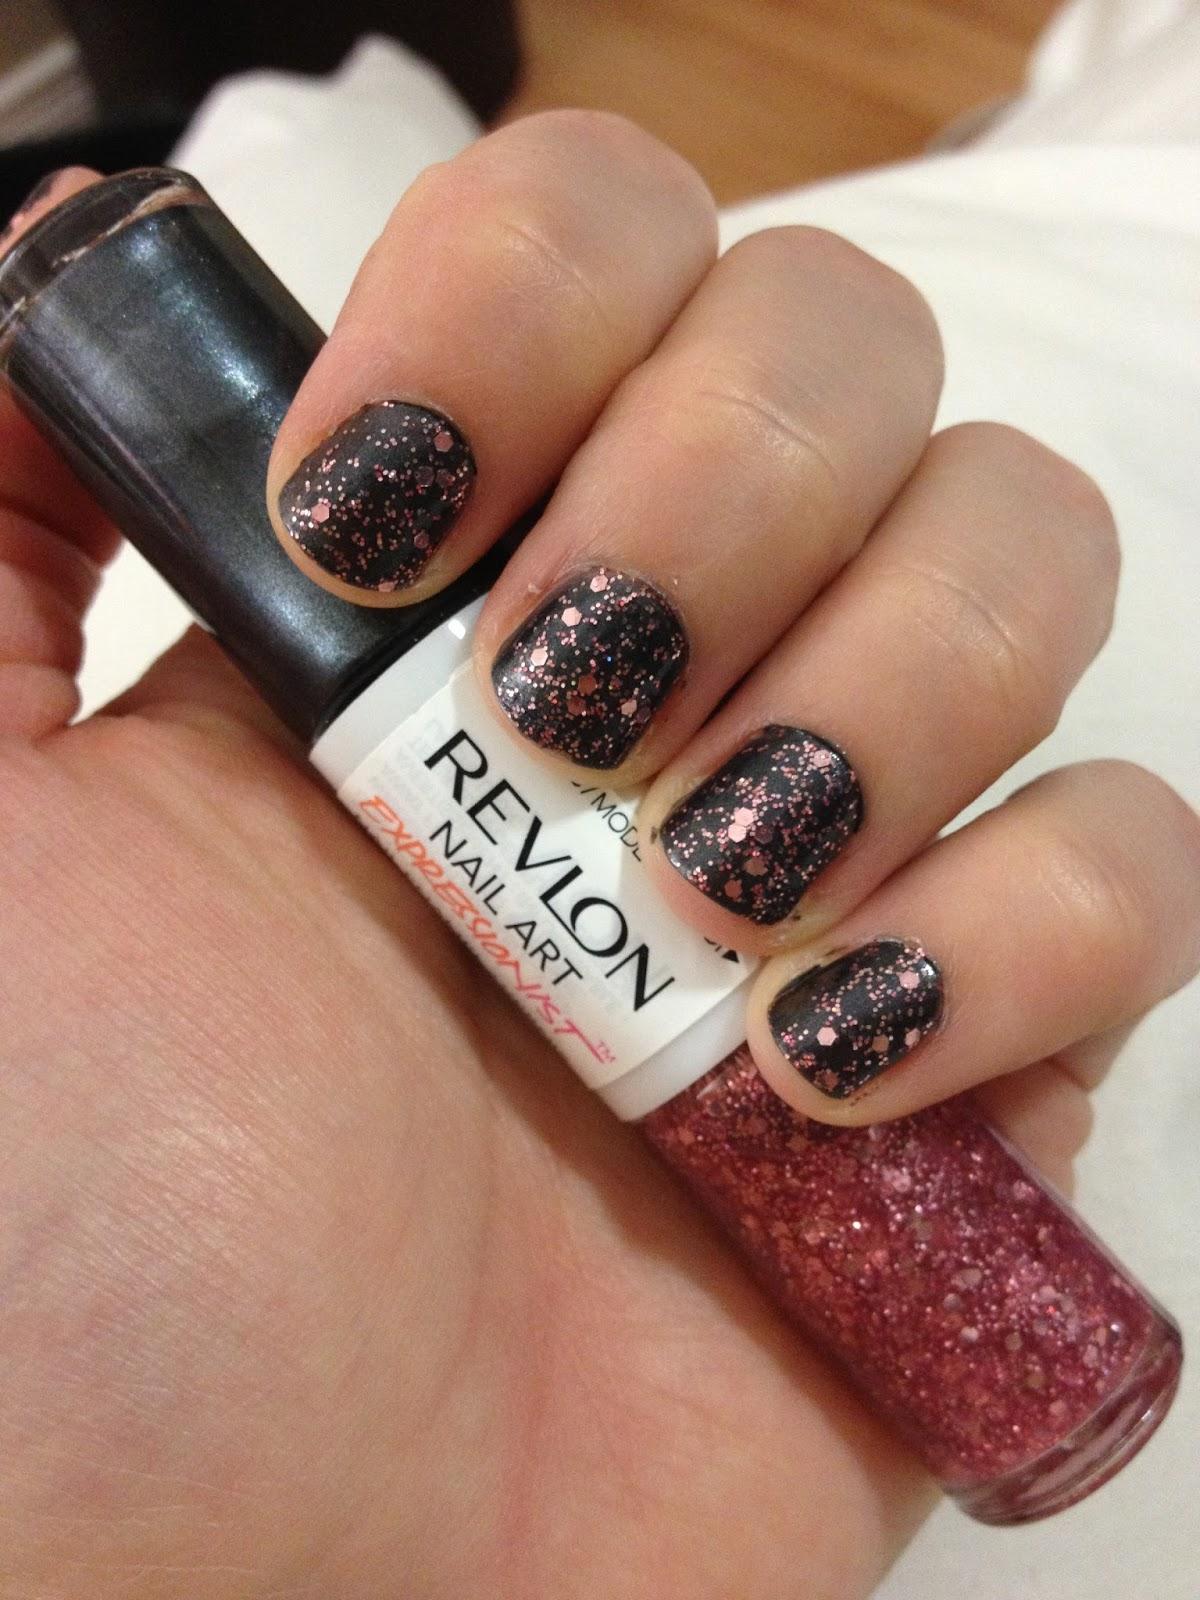 5def2b6048 Ruffles and Truffles: Revlon Nail Art Expressionist